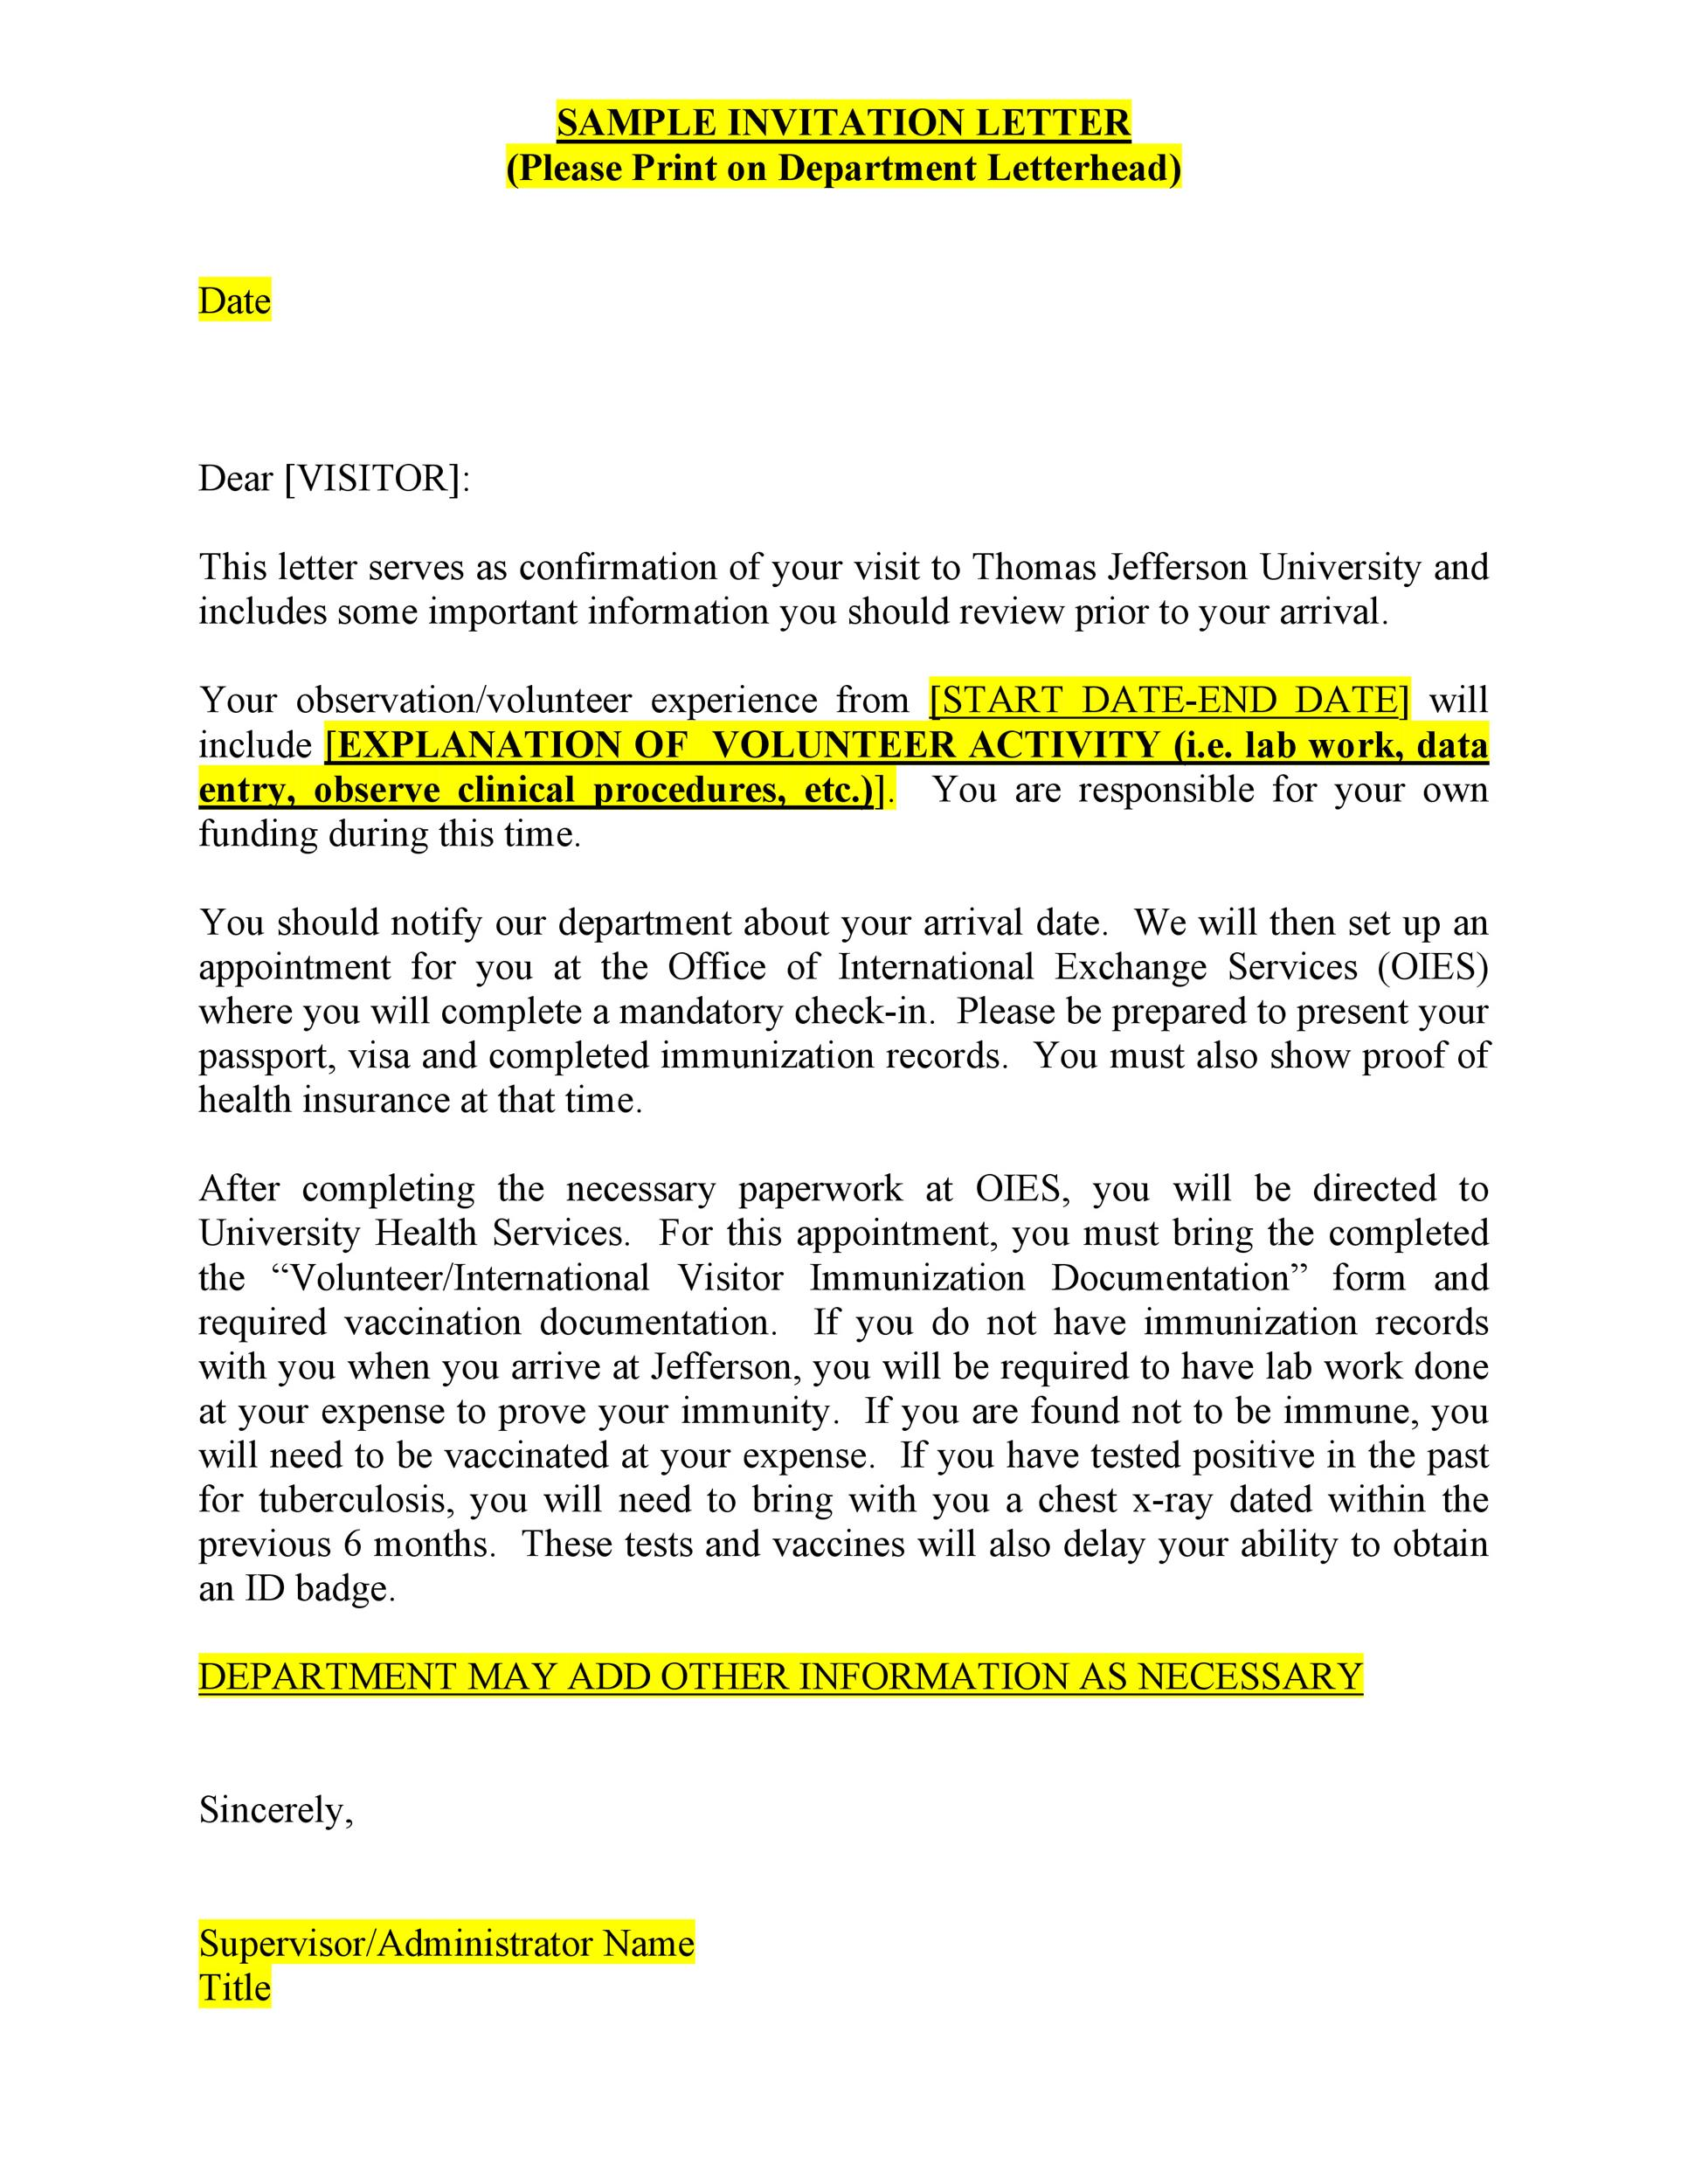 50 Best Invitation Letters (for Visa  General) ᐅ Template Lab